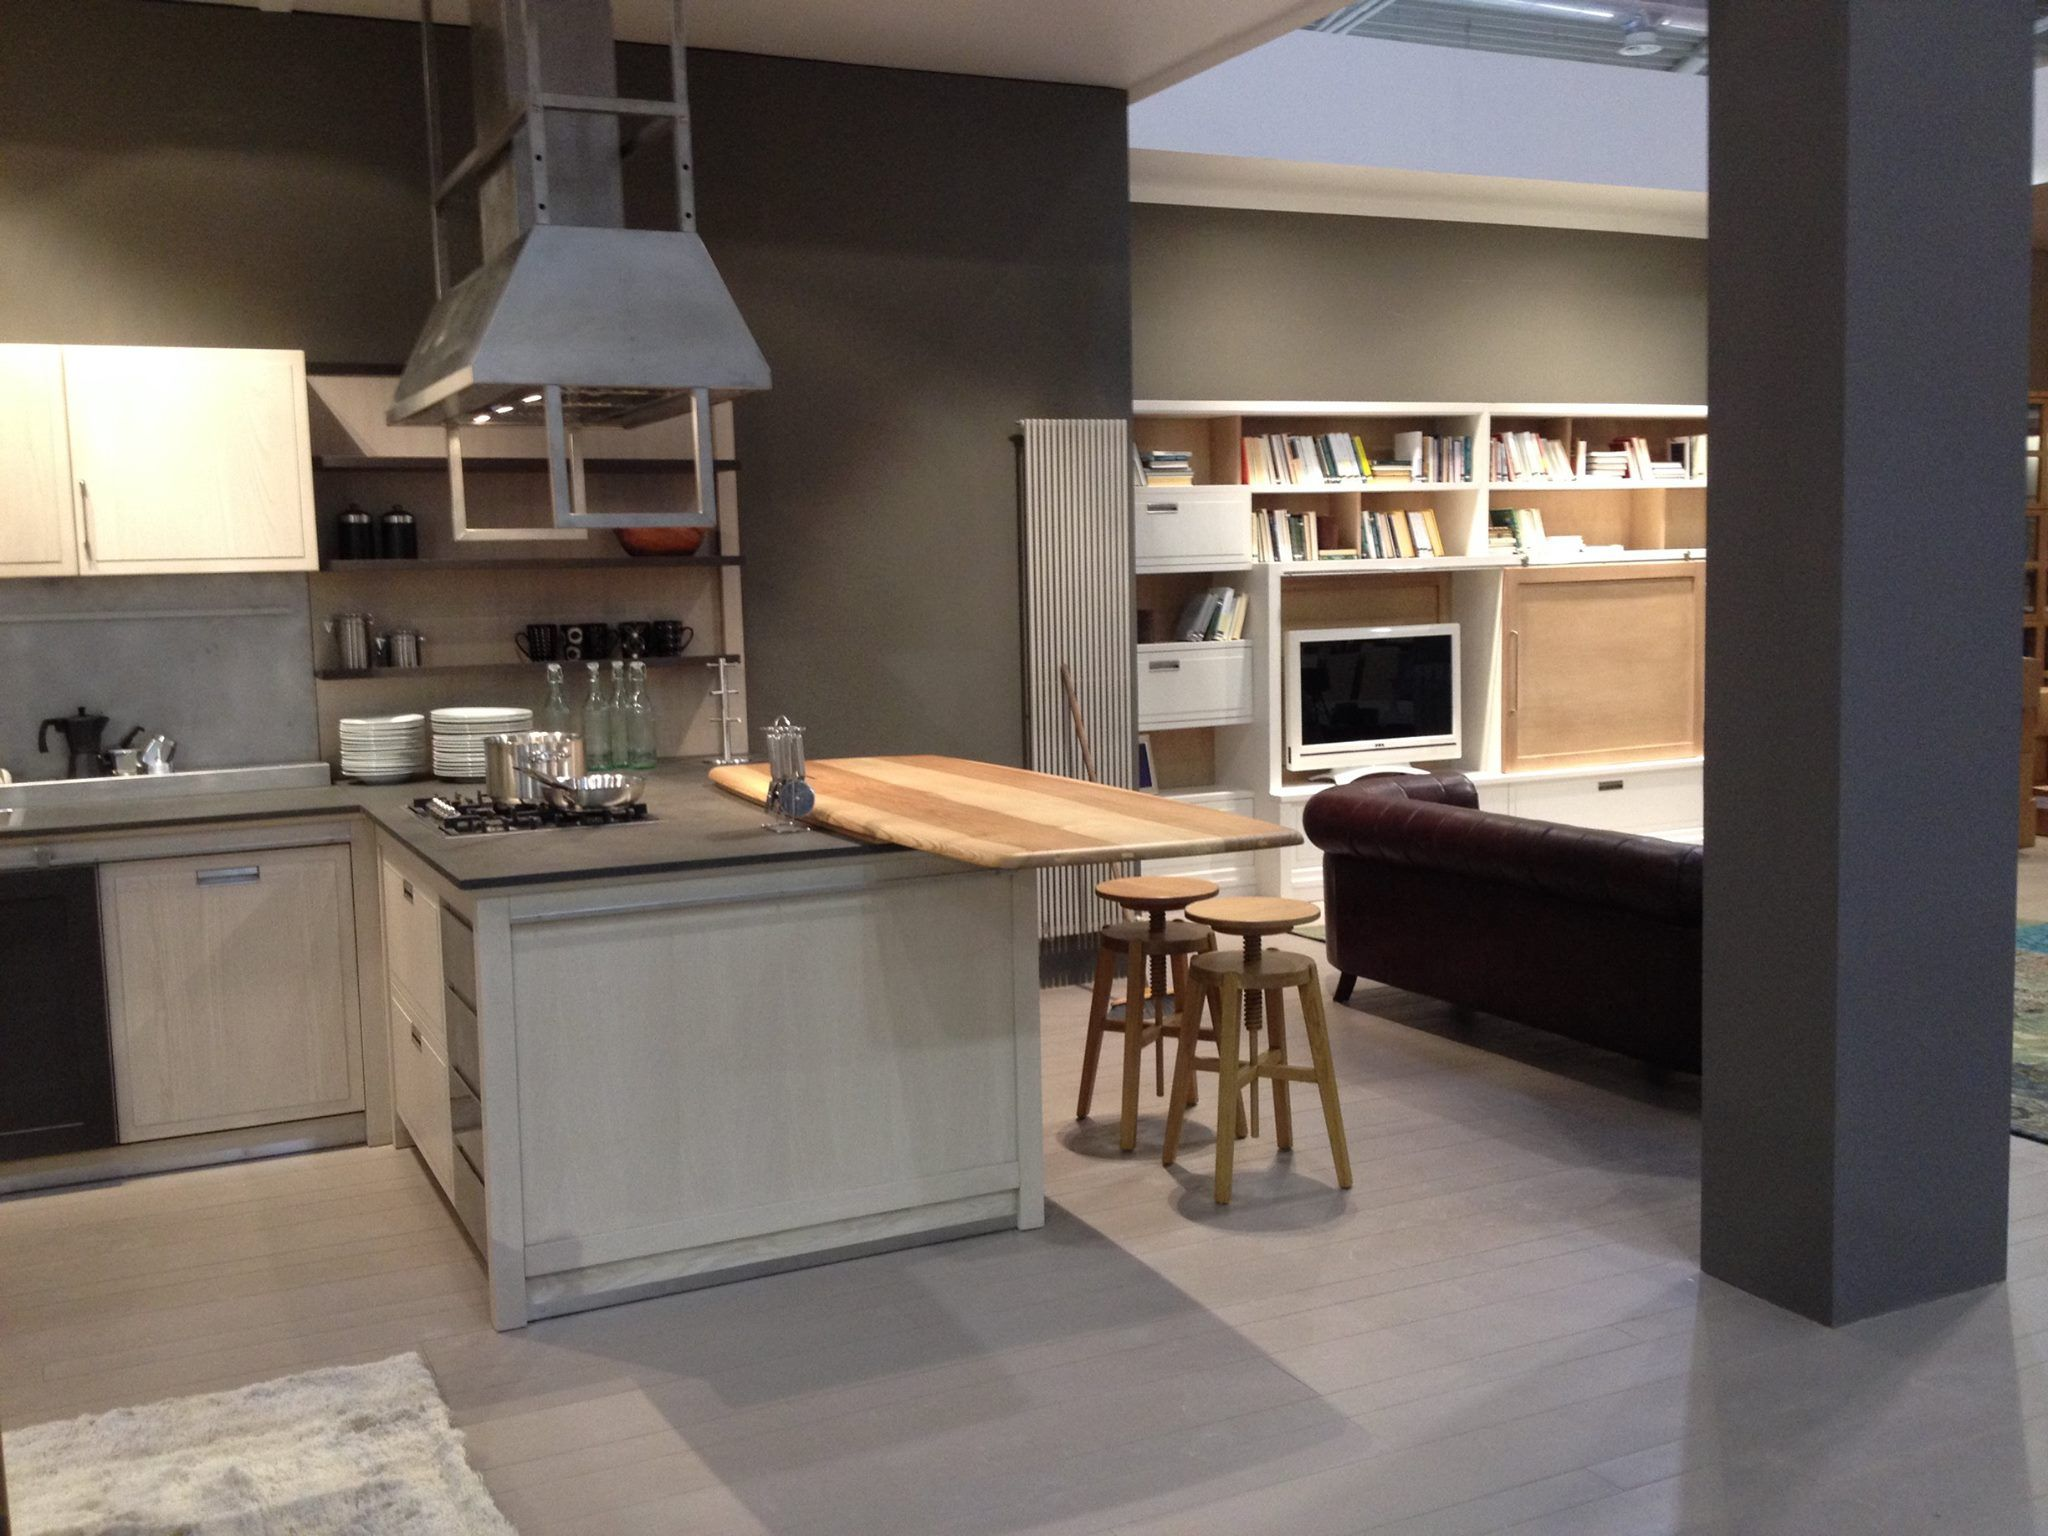 Cucine in stile post industriale | CUCINE STILE INDUSTRIAL CHIC ...